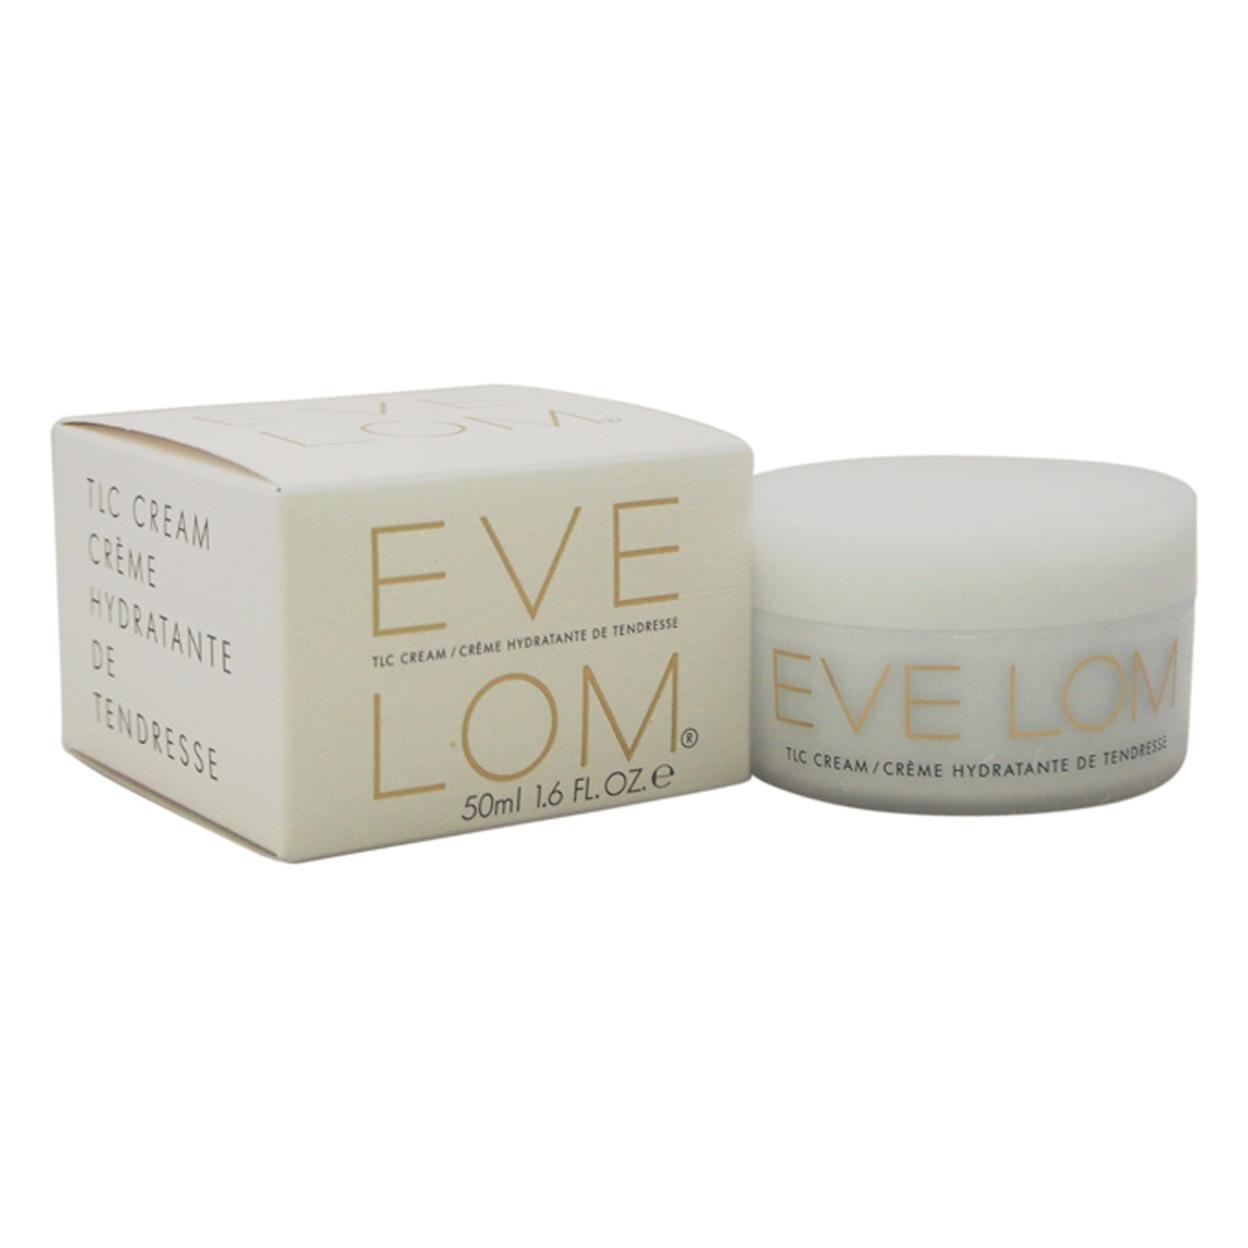 TLC Cream by Eve Lom for Unisex - 1.6 oz Cream eve lom 125ml page 9